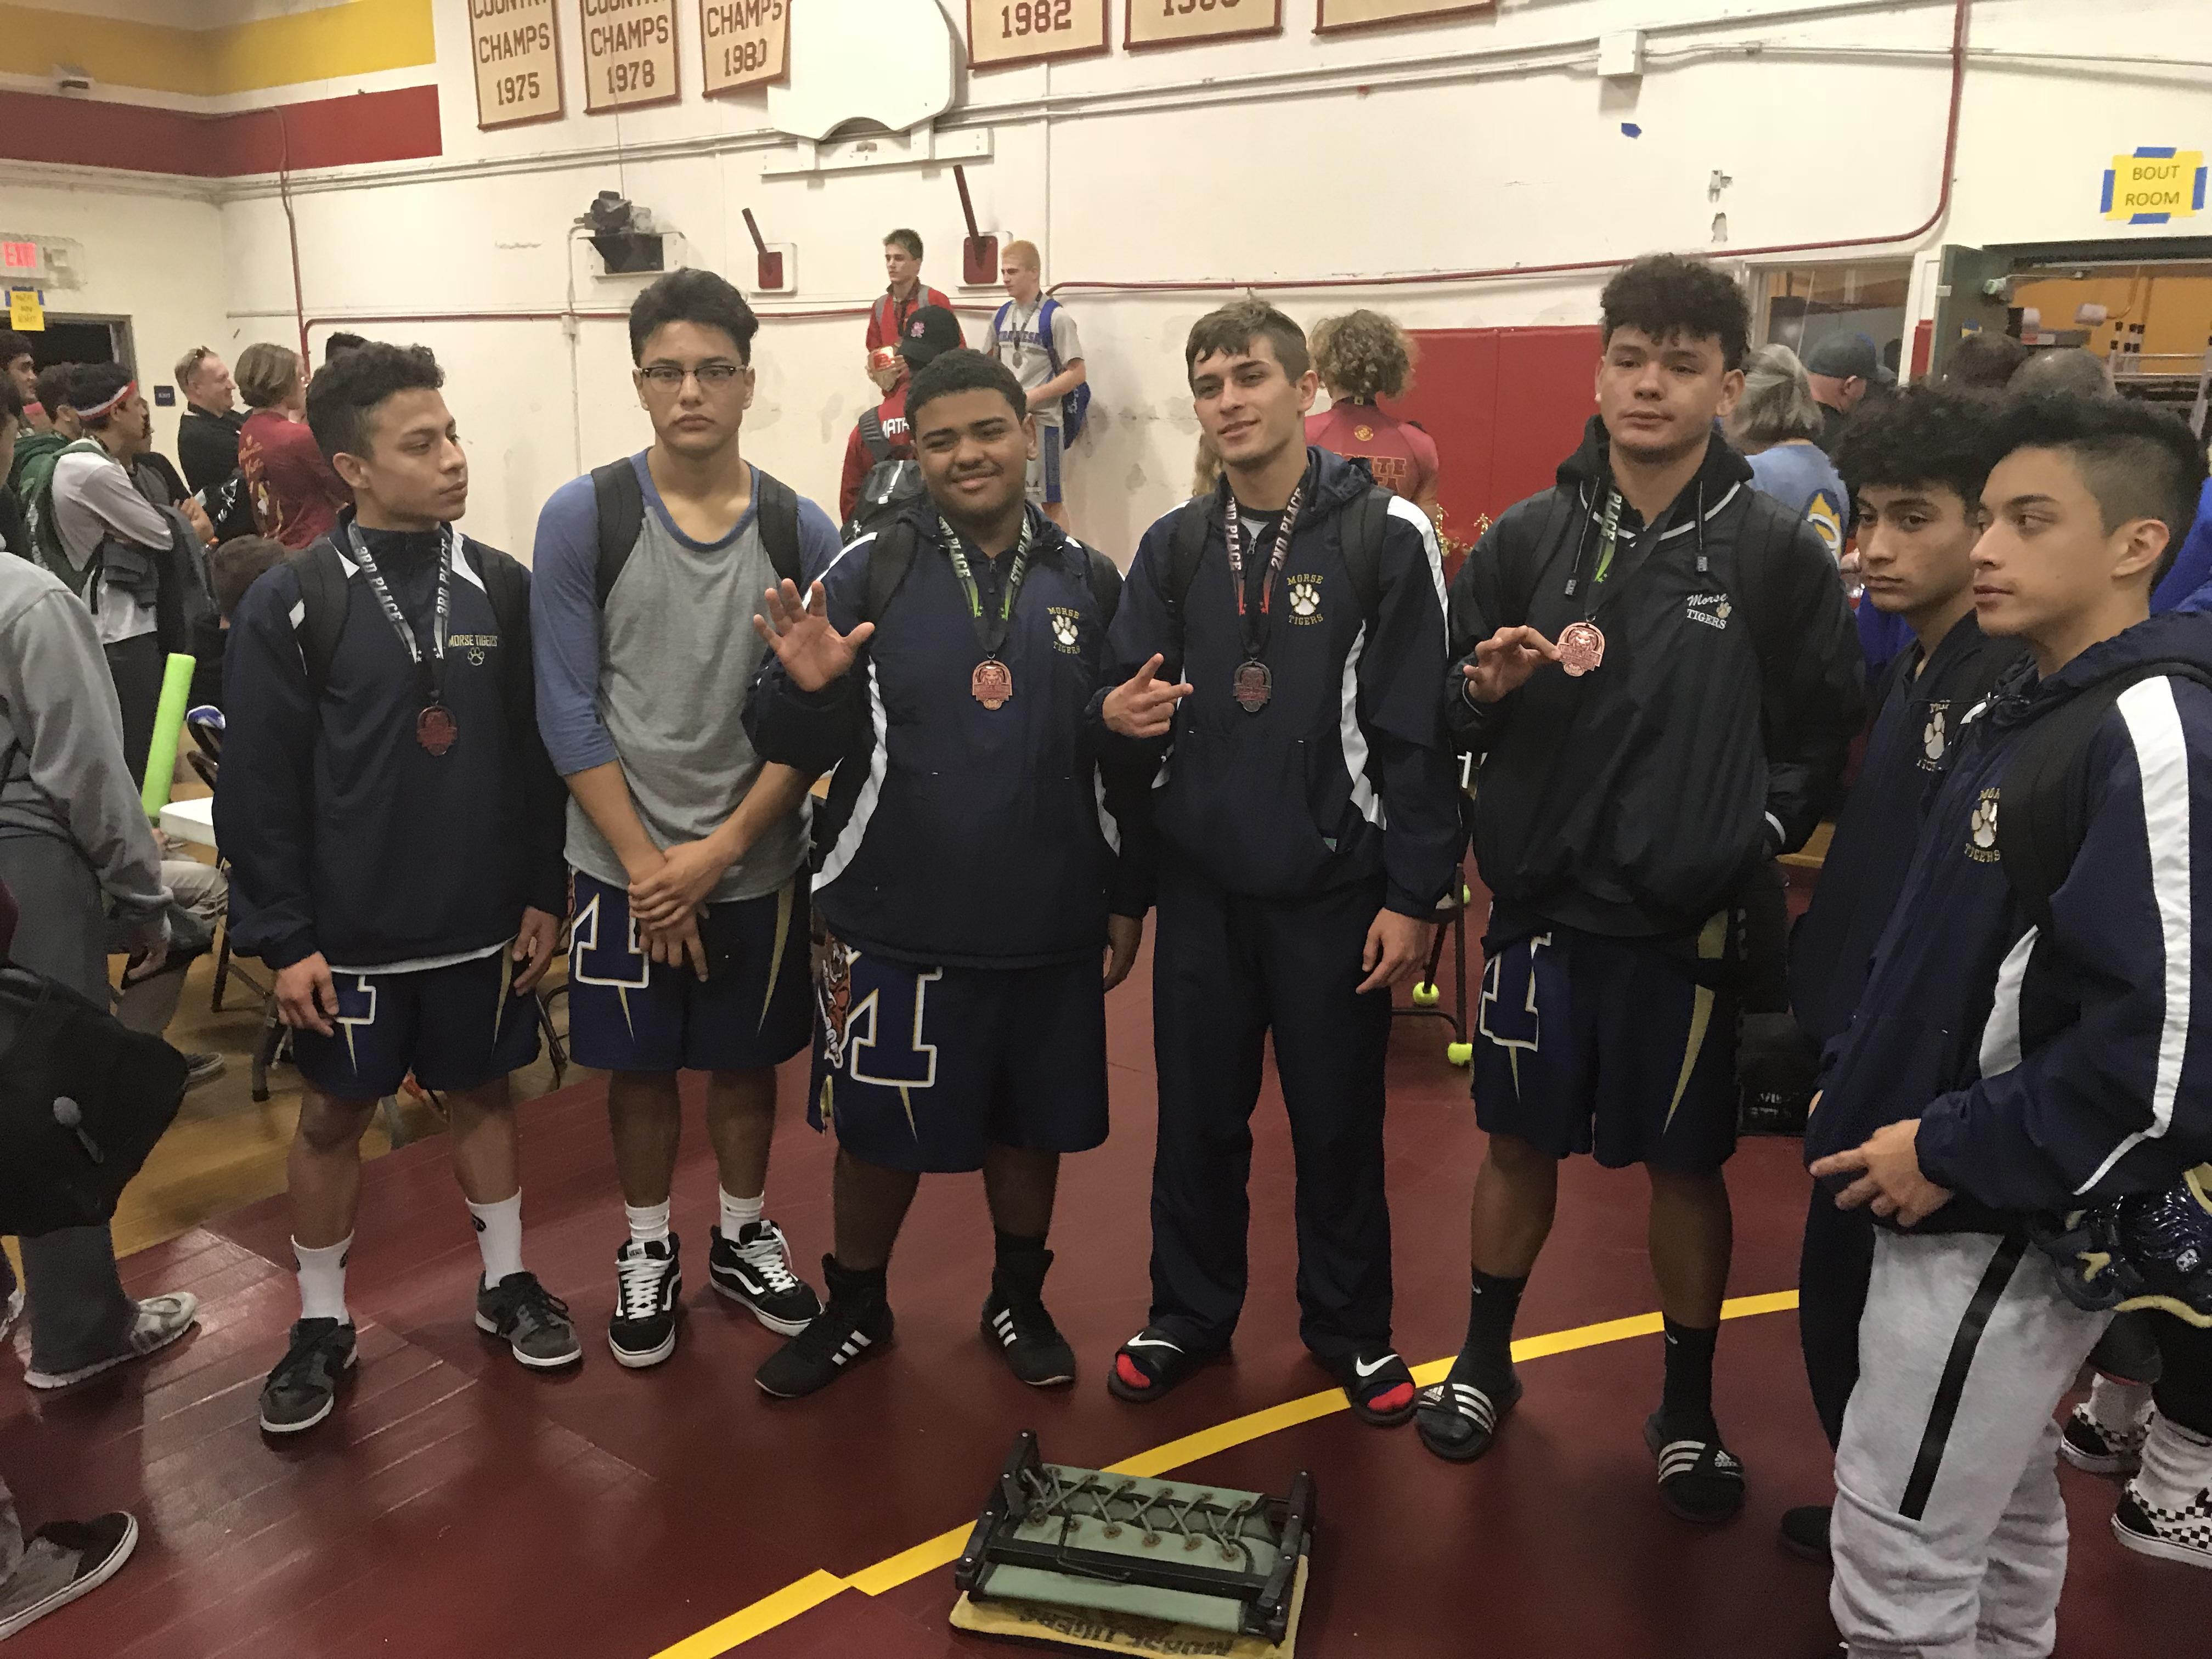 Boys Varsity Wrestling, Gonzalez takes 2nd place at Monte Vista/Spring Valley